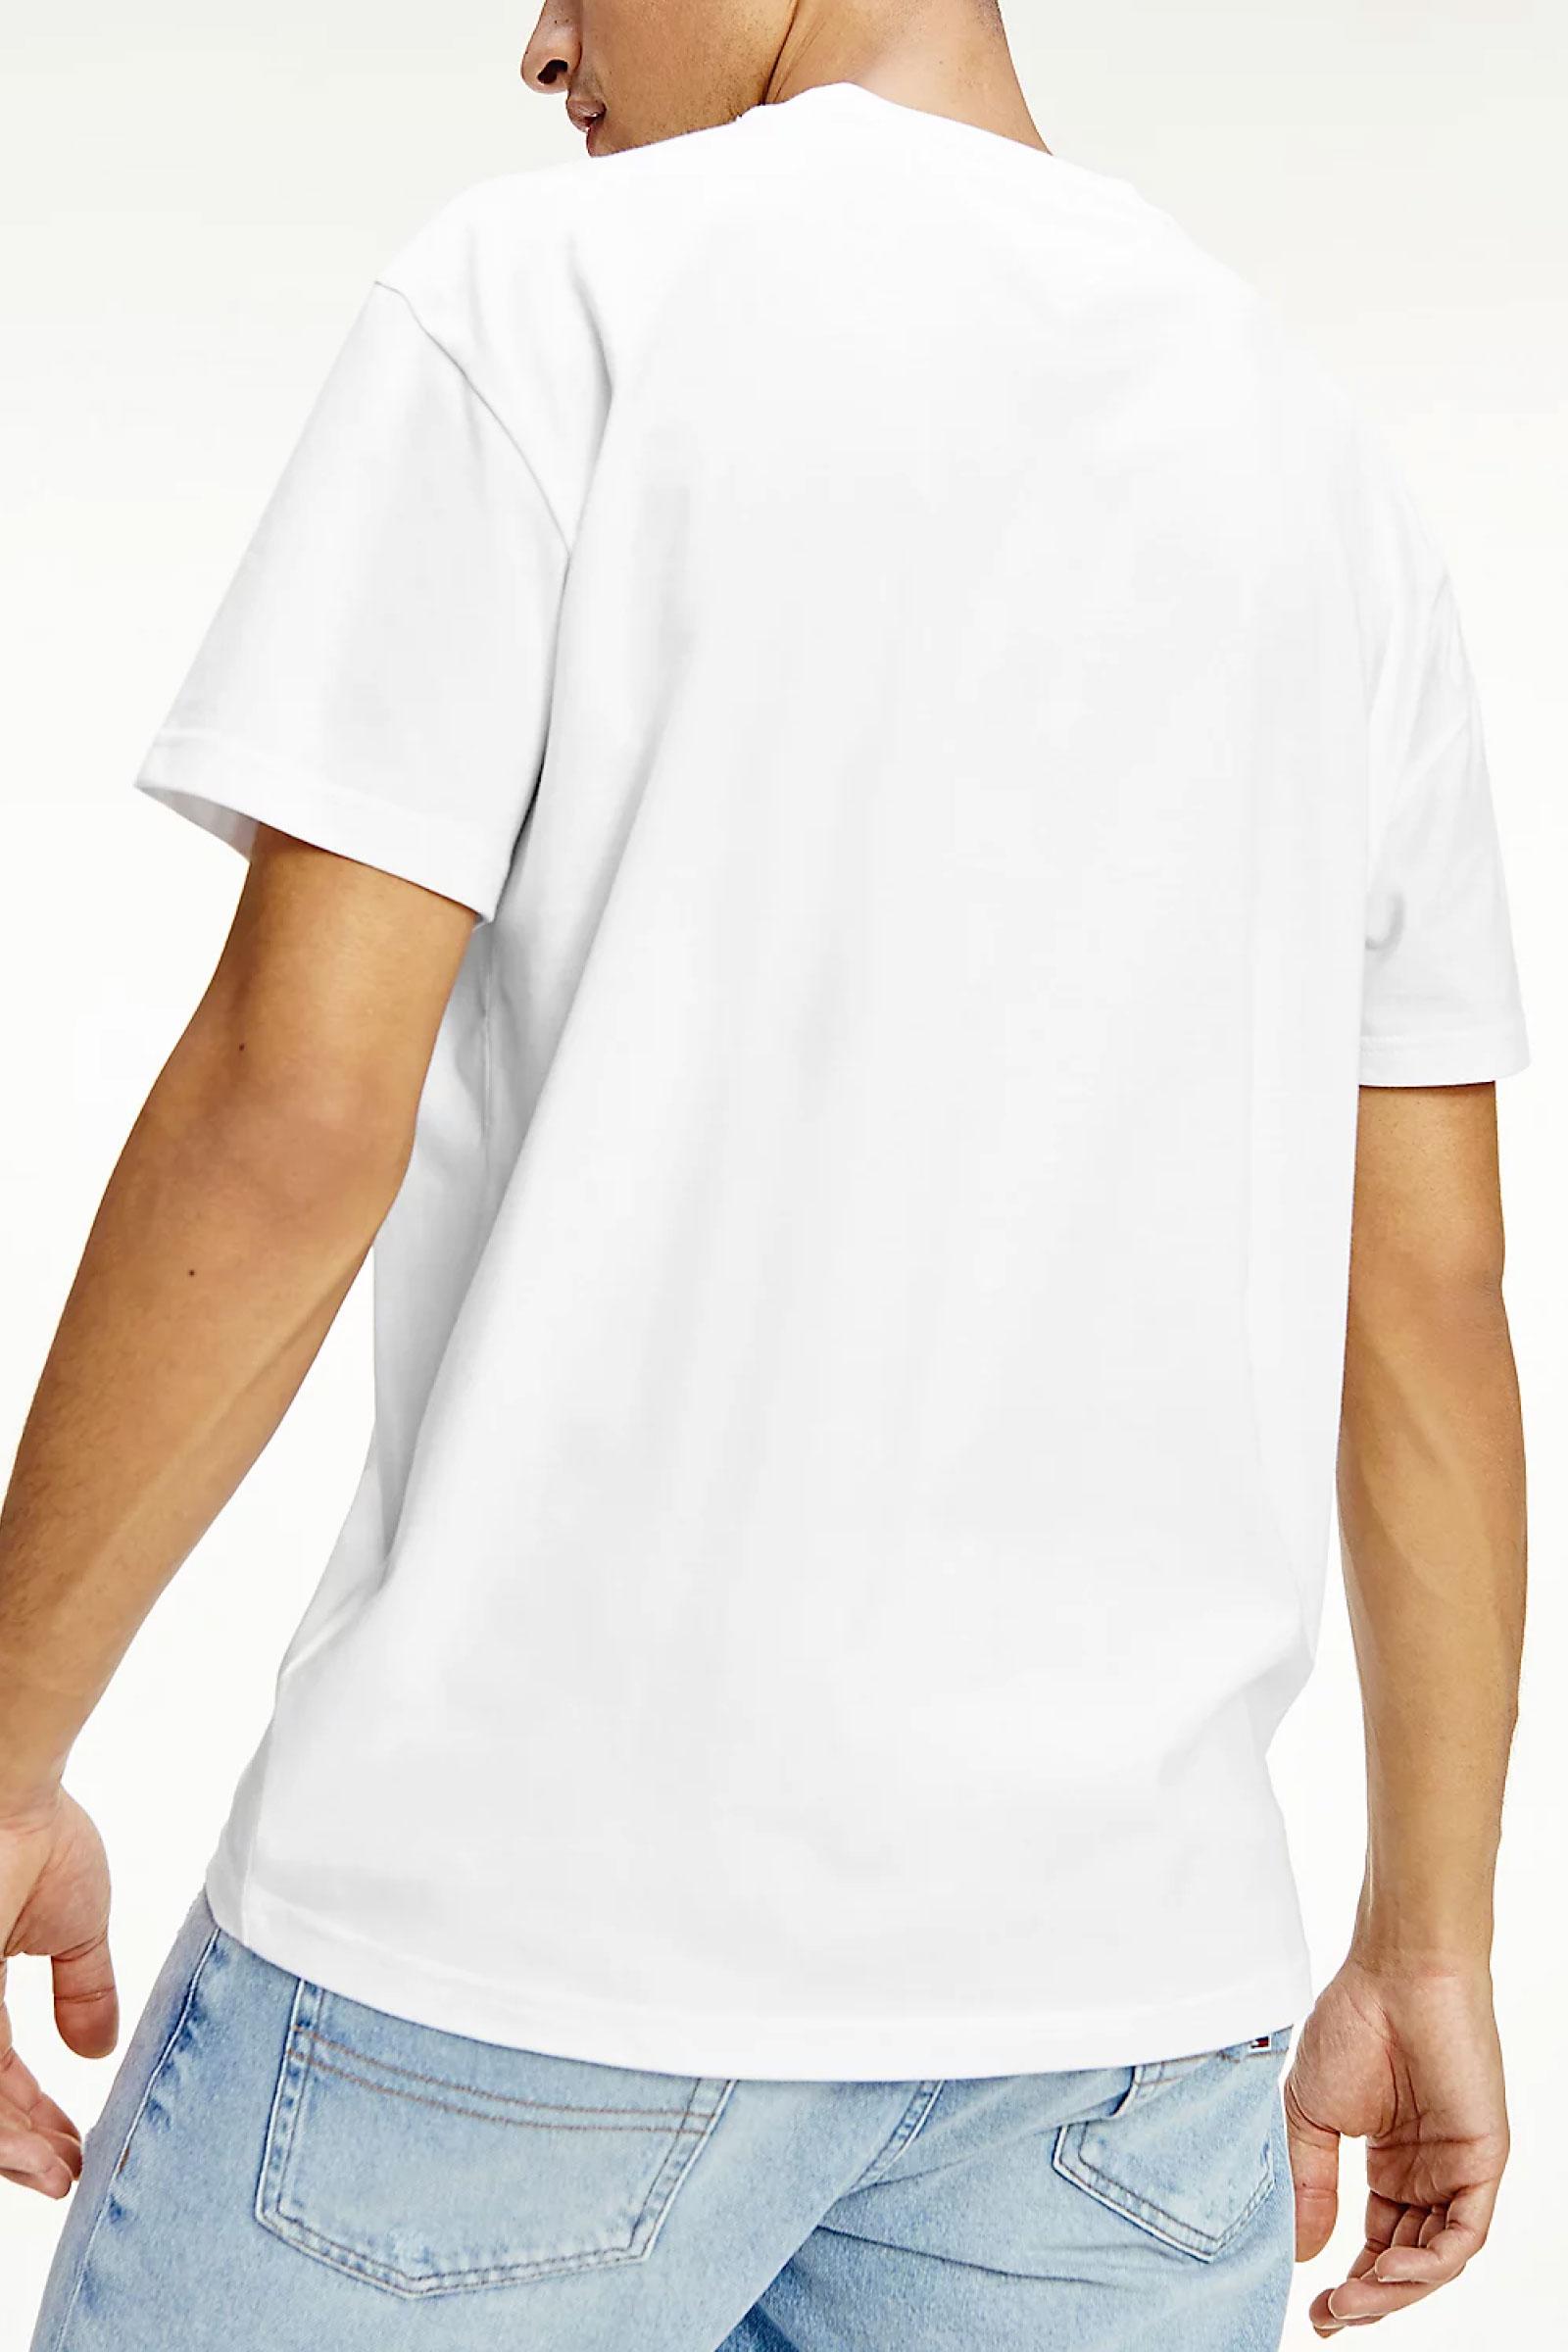 TOMMY JEANS | T-Shirt | DM0DM10233YBR